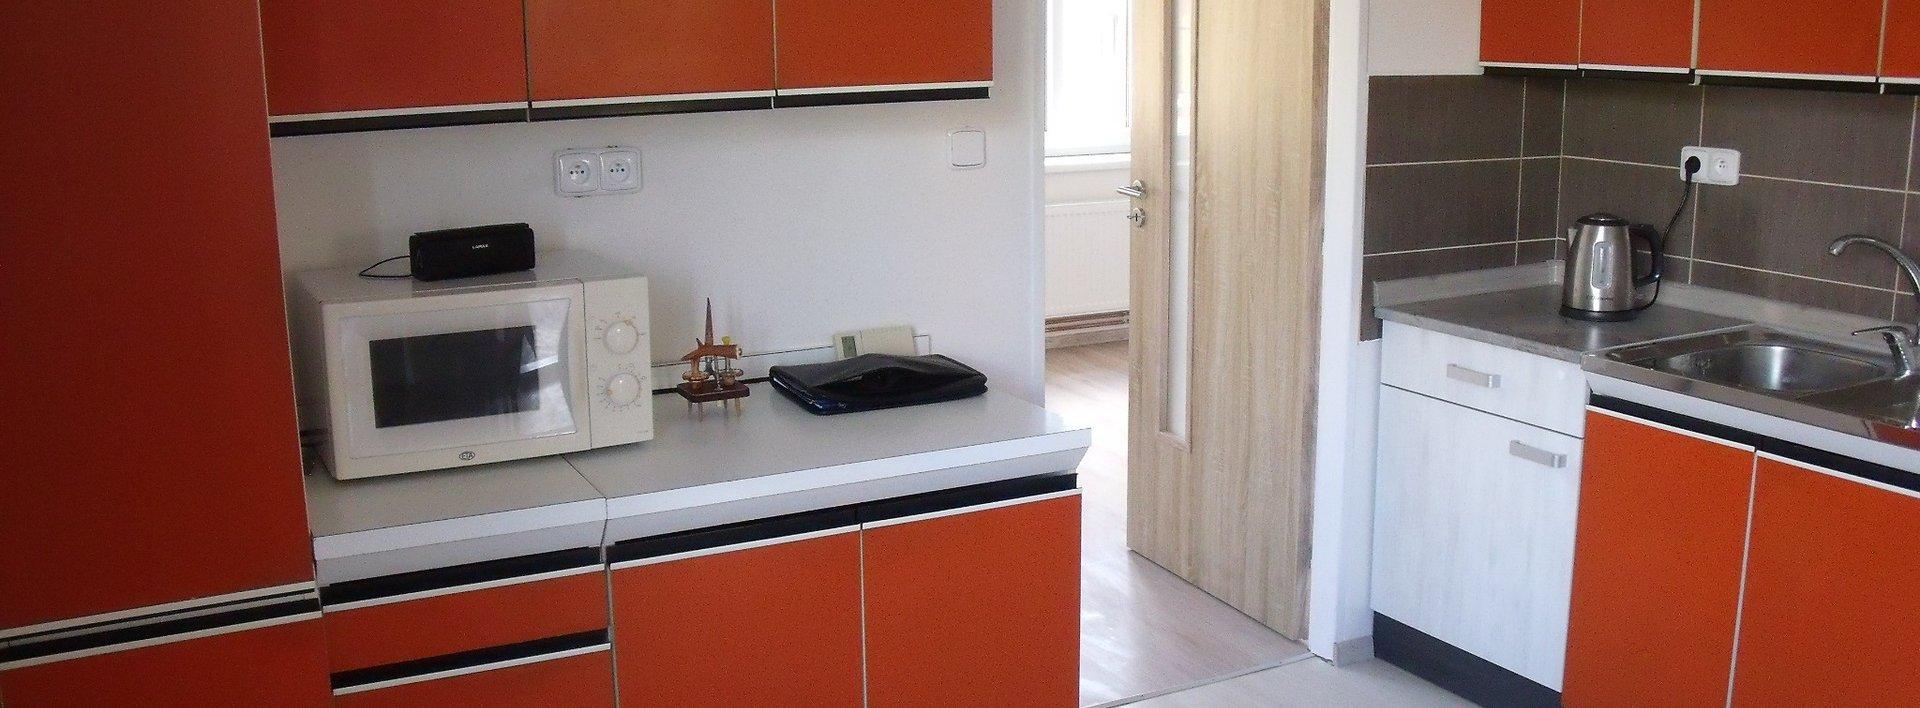 Pronájem hezkého bytu 2+1 po rekonstrukci - Hodkovice n. M., Ev.č.: N48600